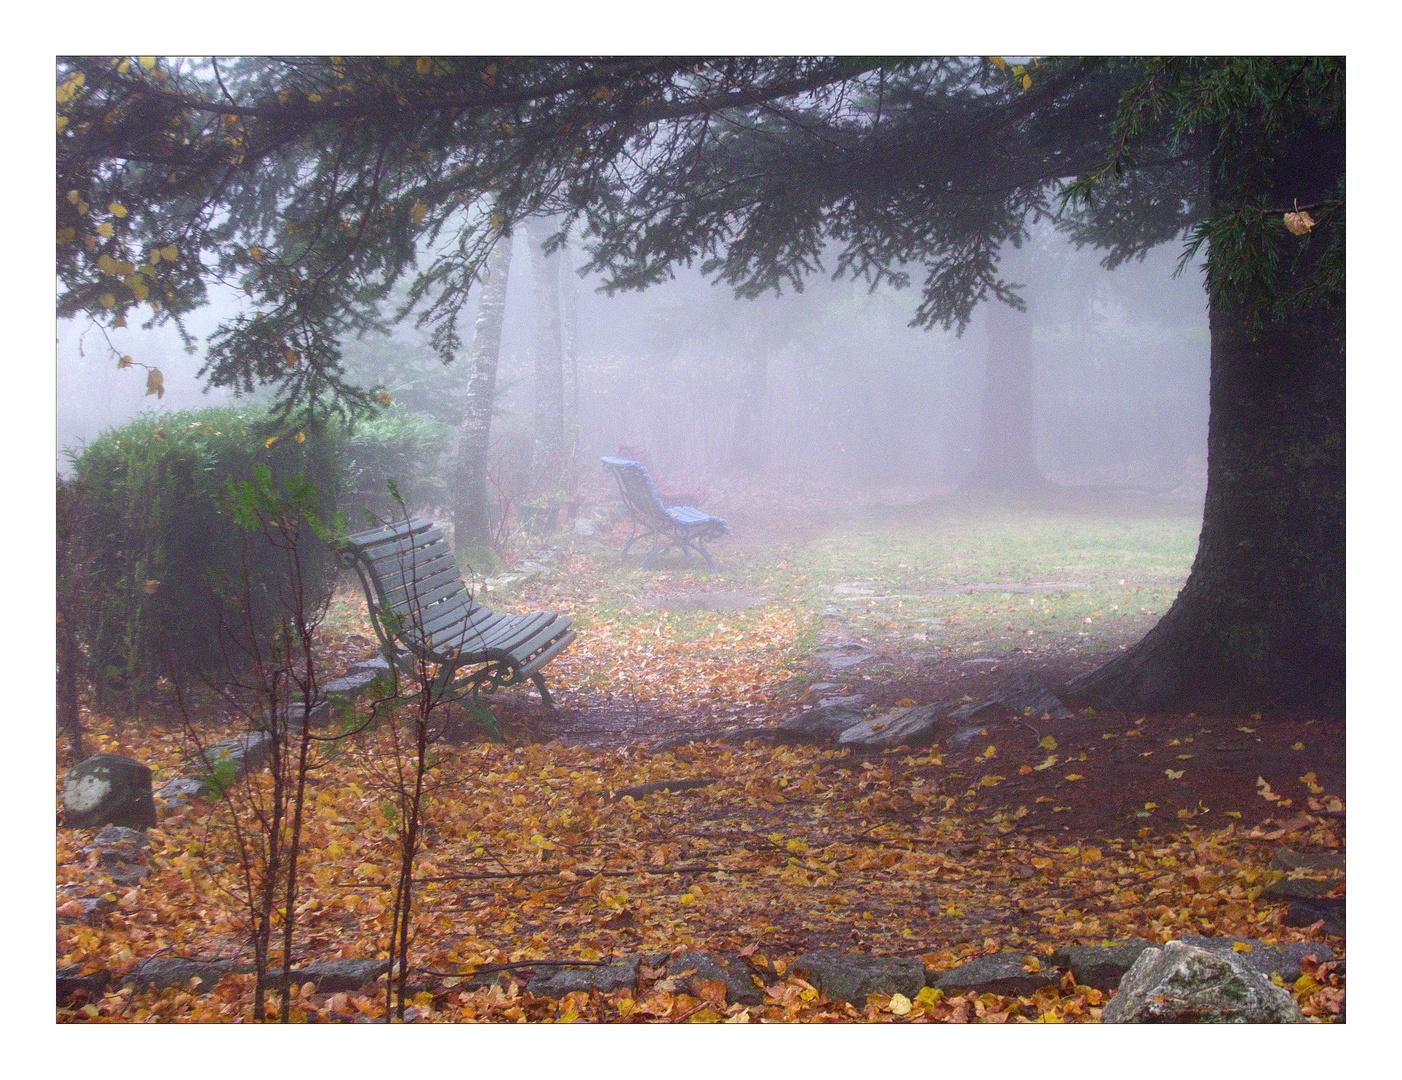 Otoño y niebla